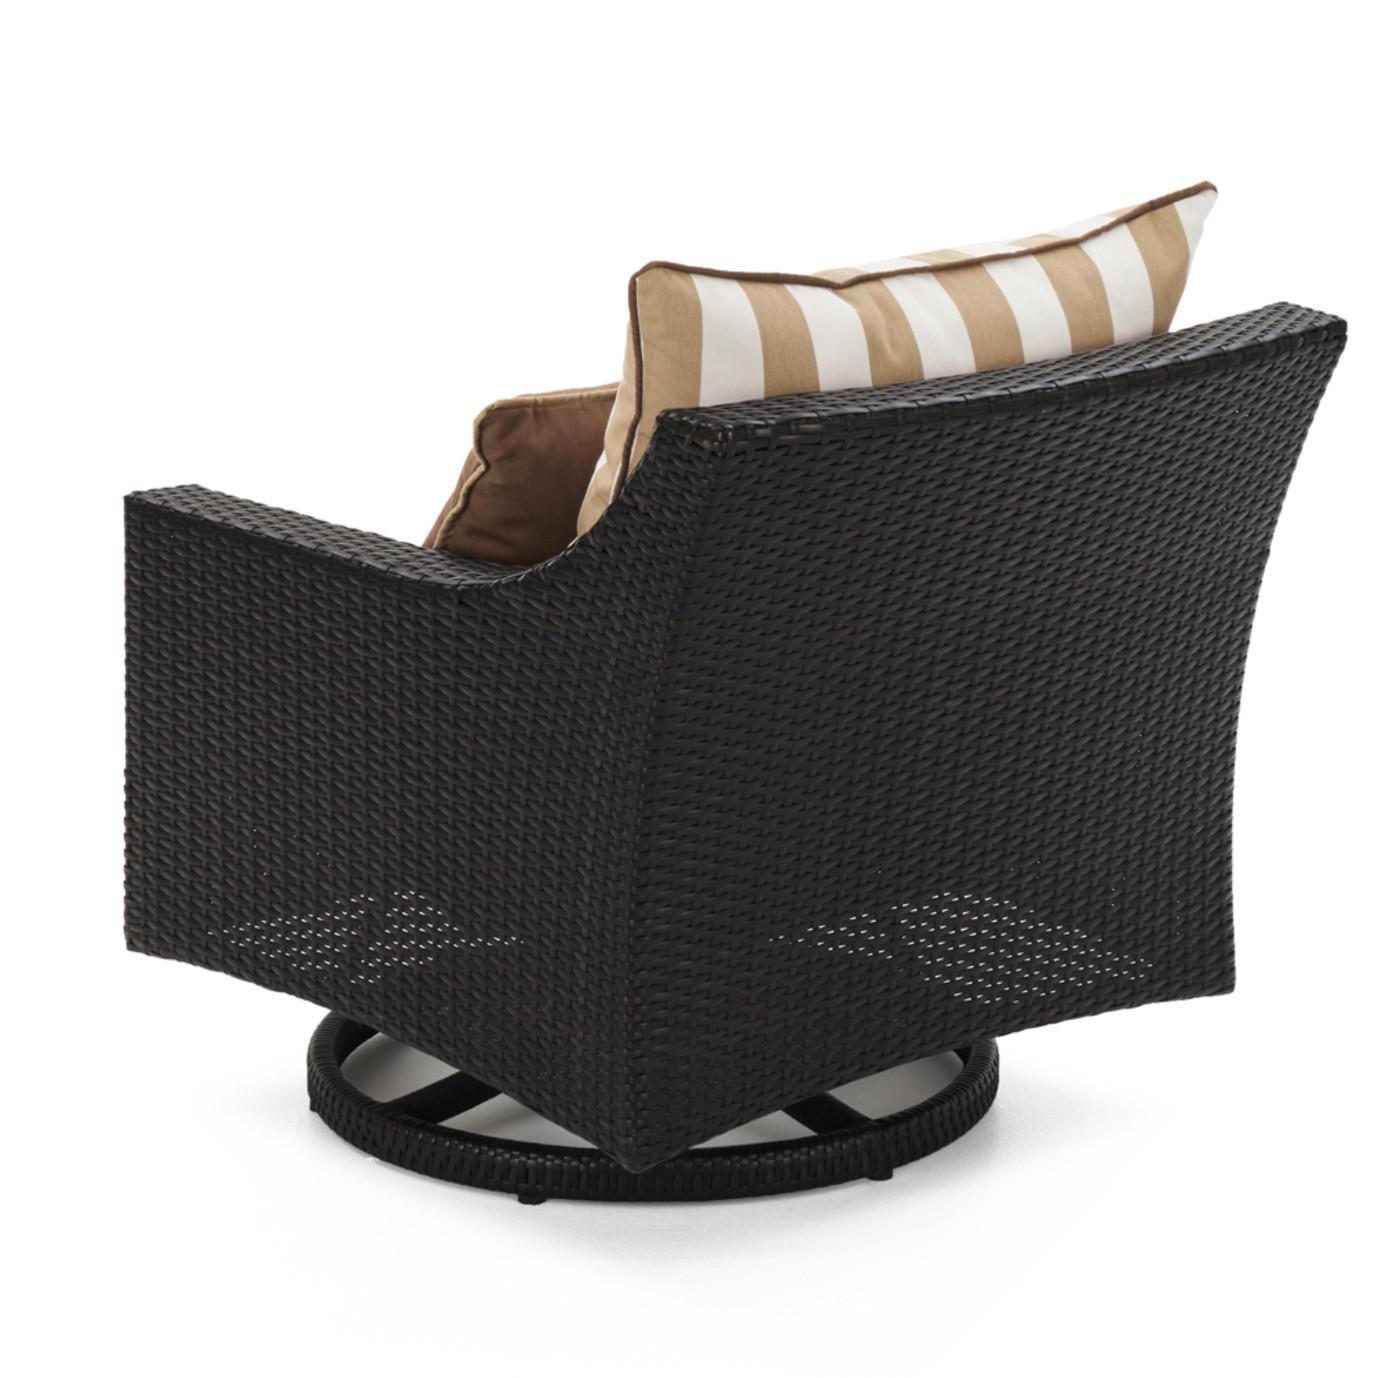 Deco™ 8pc Sofa & Club Chair Set - Maxim Beige Design